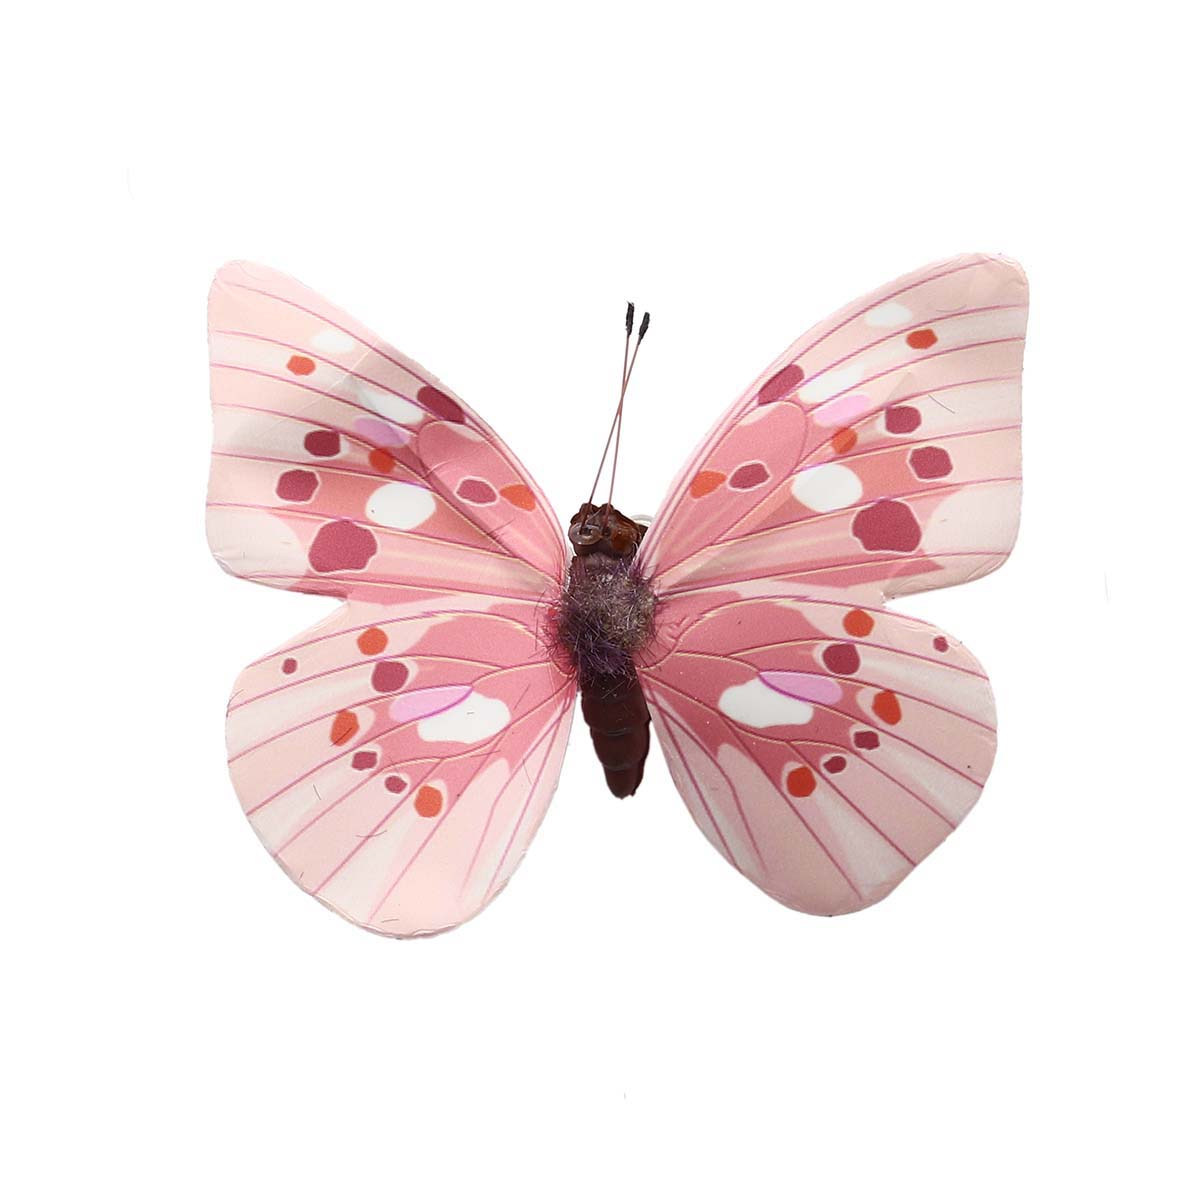 67101002 Бабочки, ассорти, упак./1 шт., Glorex